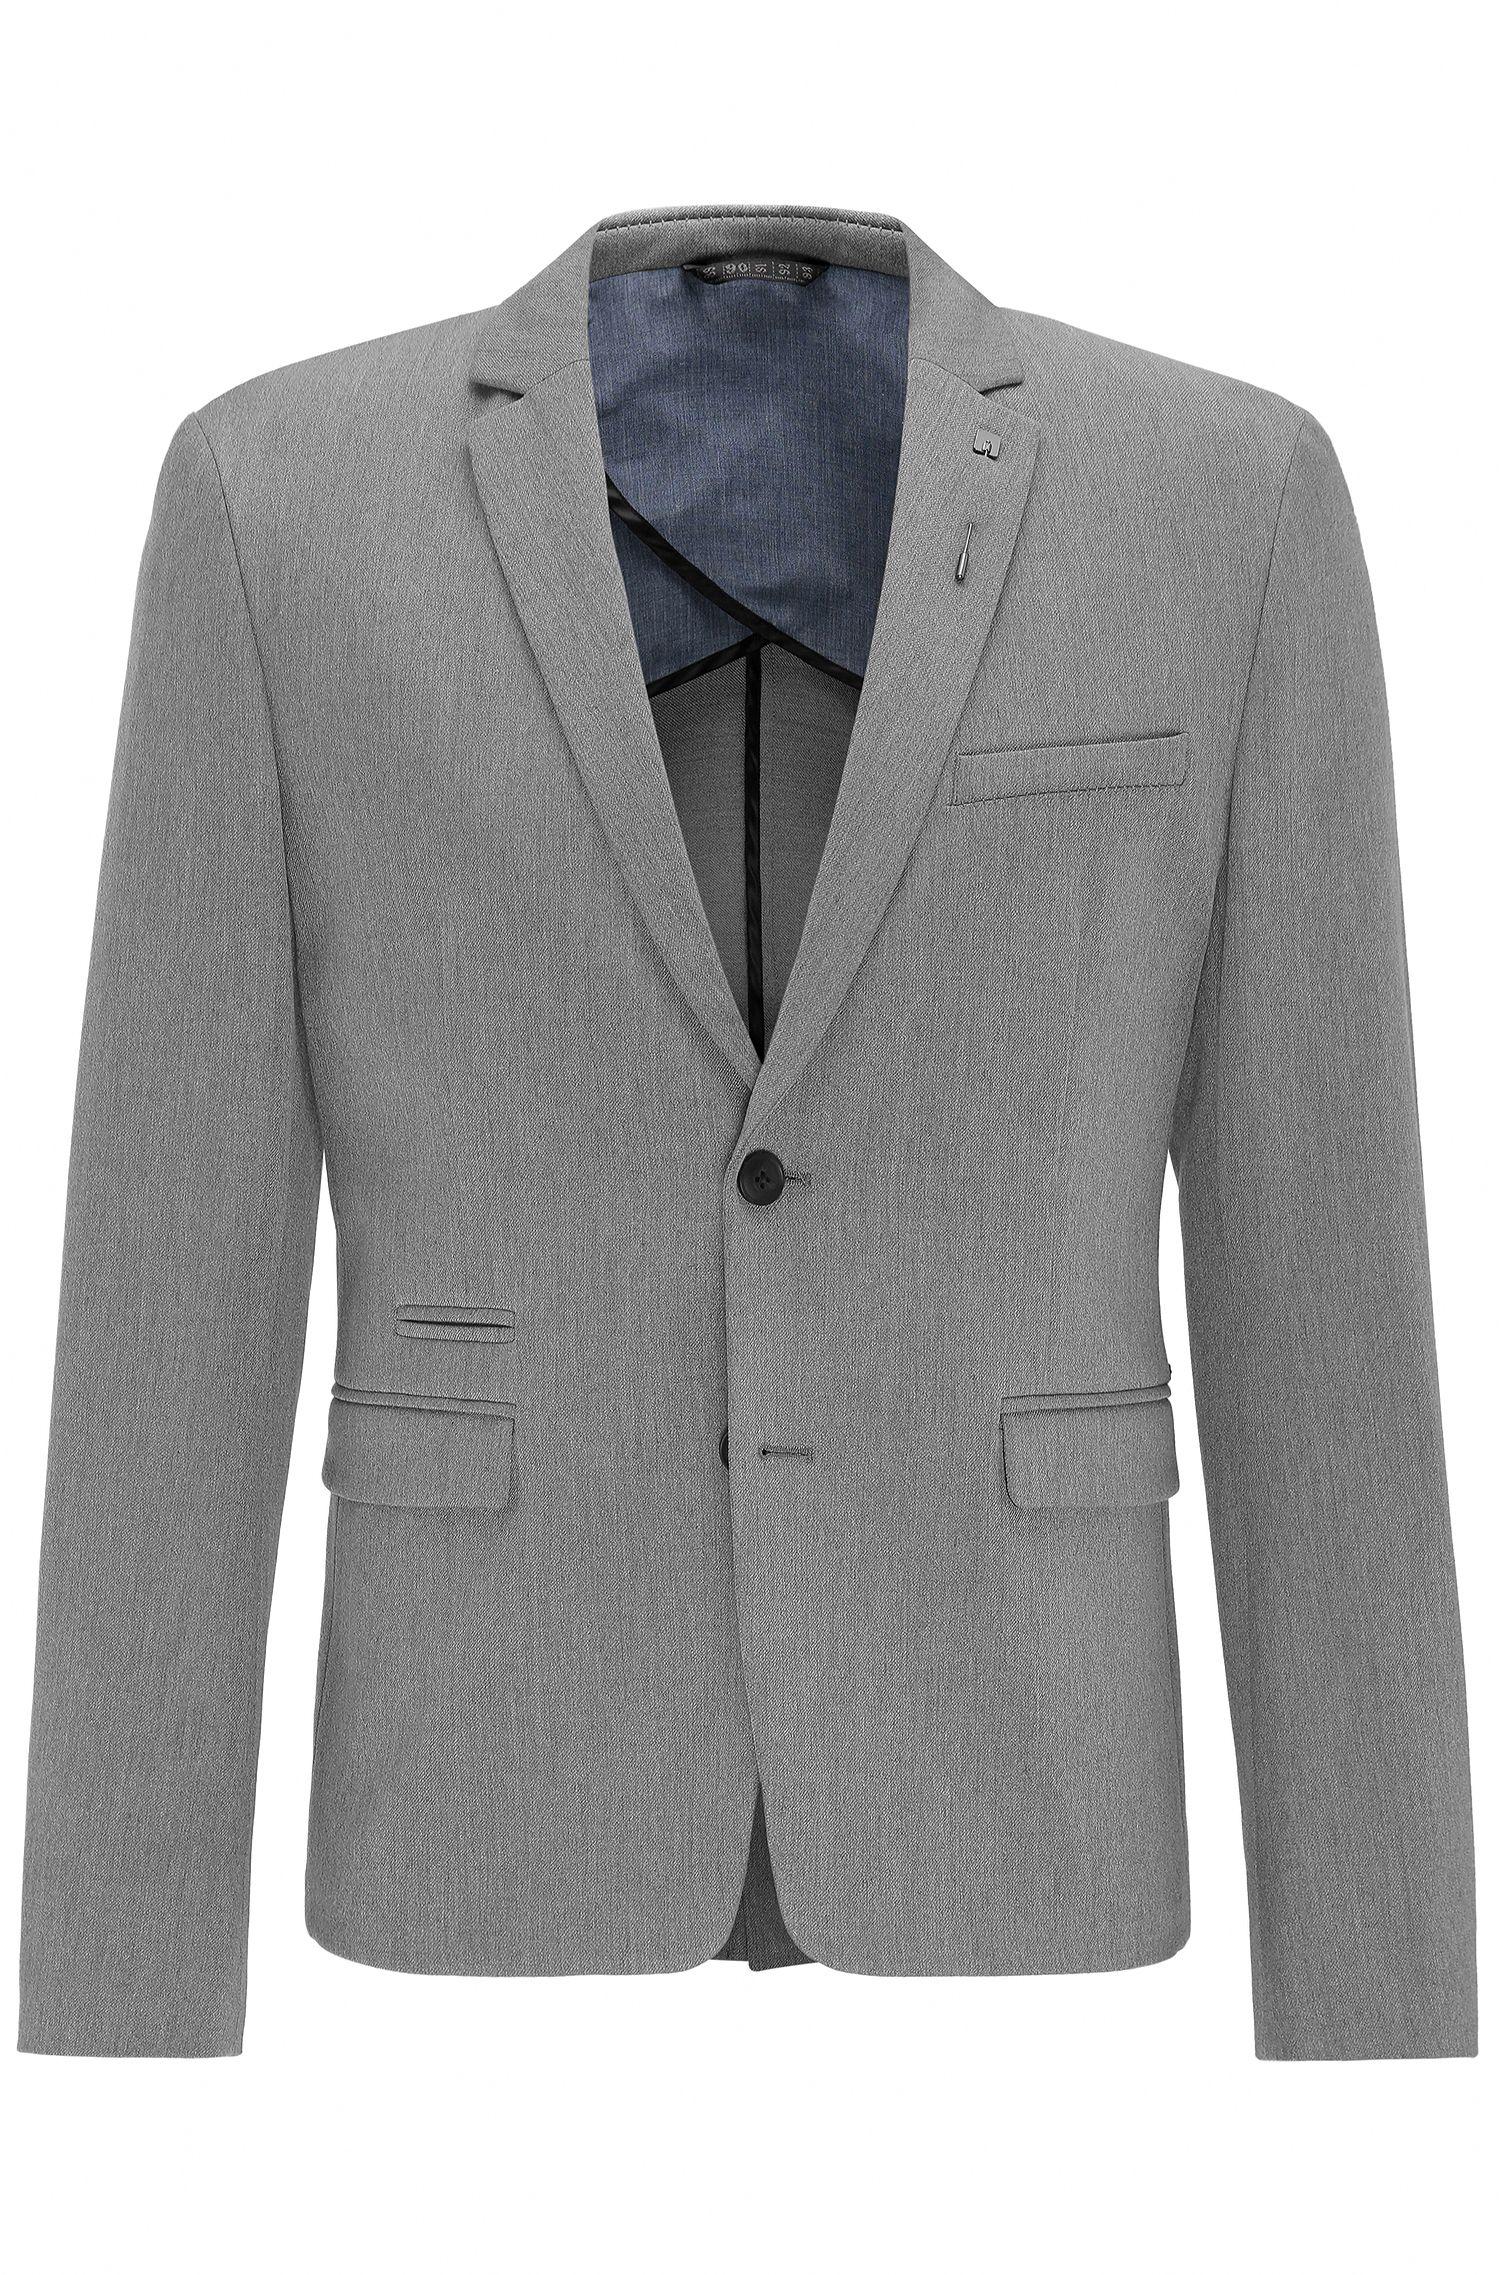 Stretch Blend Sport Coat, Slim Fit | Bats BS, Light Grey